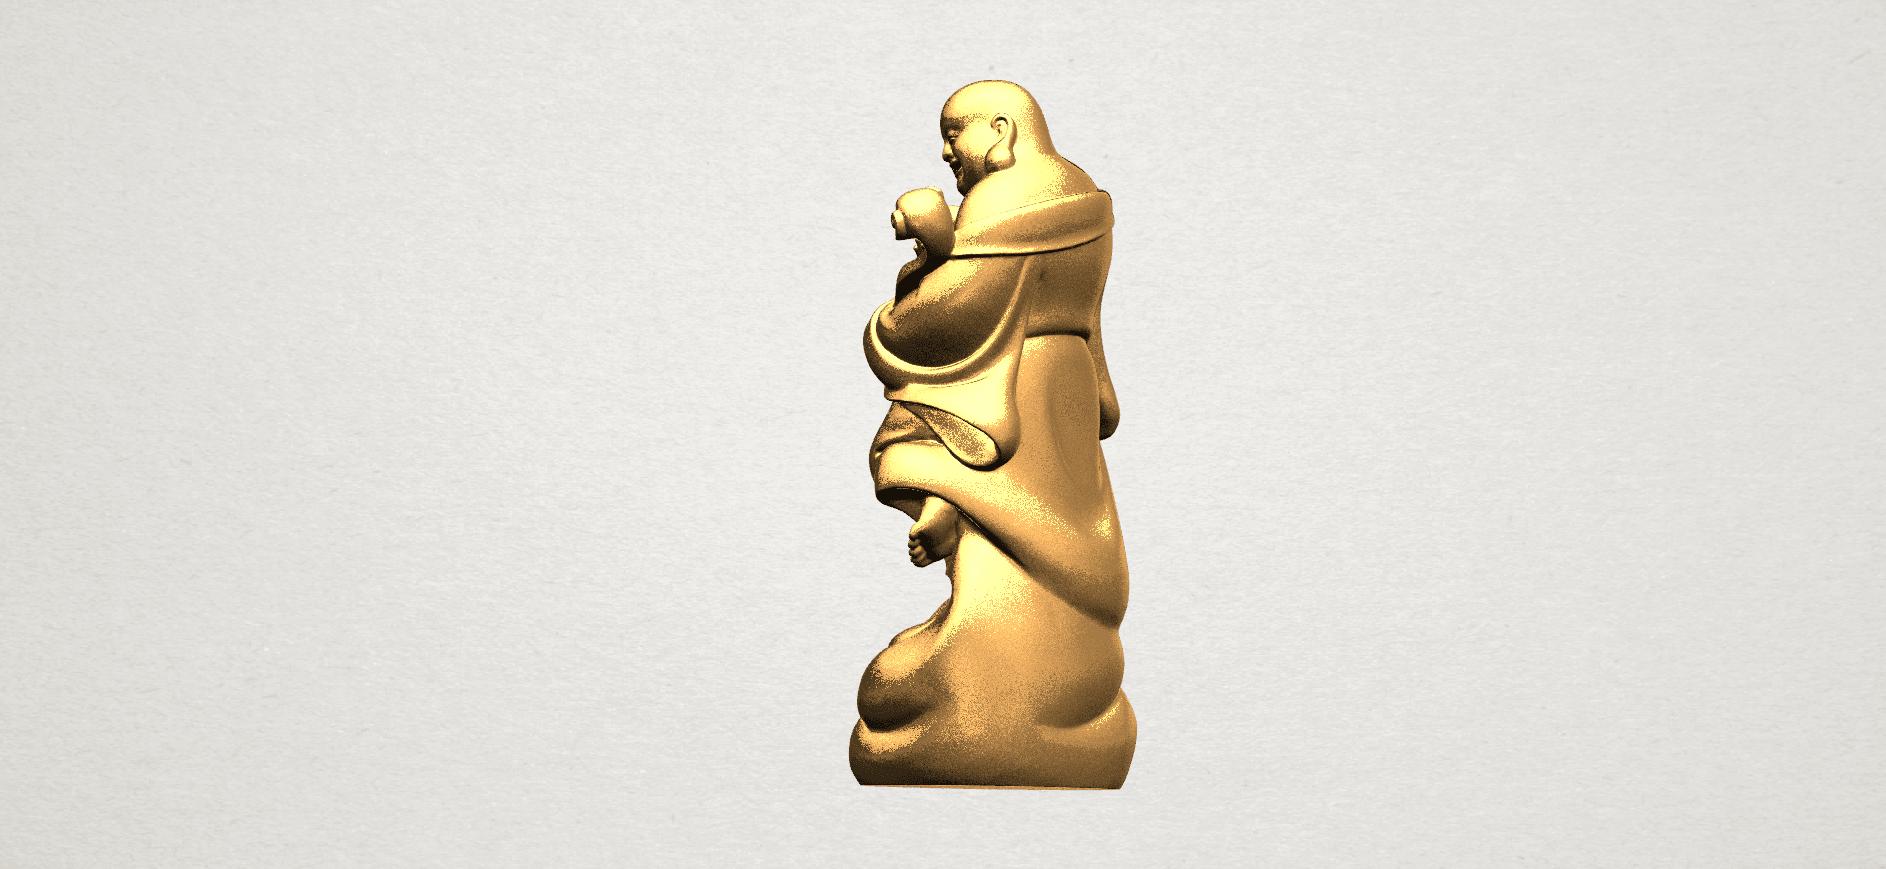 TDA0070 Metteyya Buddha 04 - 88mm - A04.png Download free STL file Metteyya Buddha 04 • 3D printable object, GeorgesNikkei